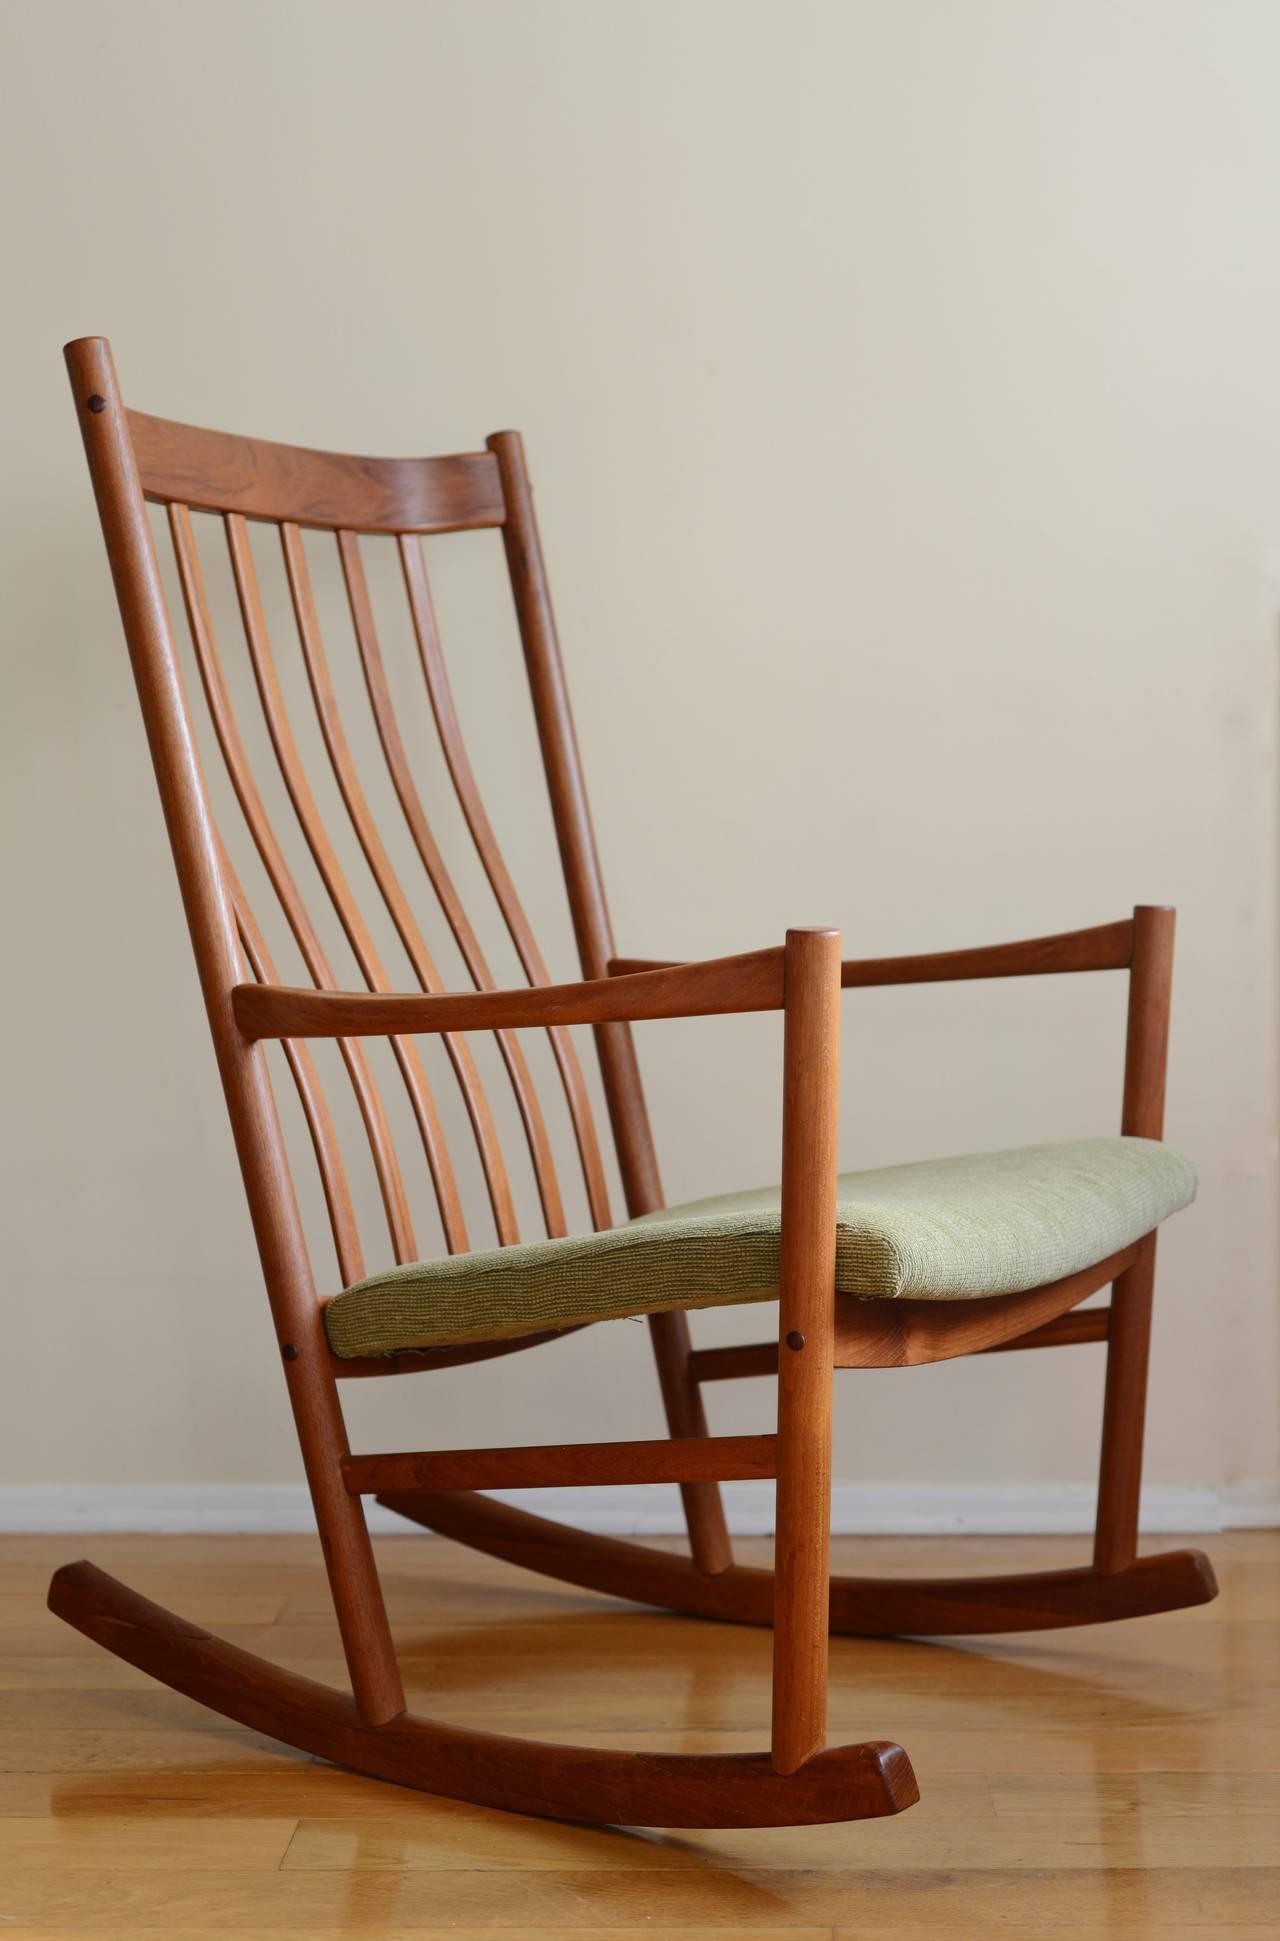 hans wegner rocking chair small chaise lounge chairs for bedroom uk teak at 1stdibs tarm stole denmark 1965 upholstery